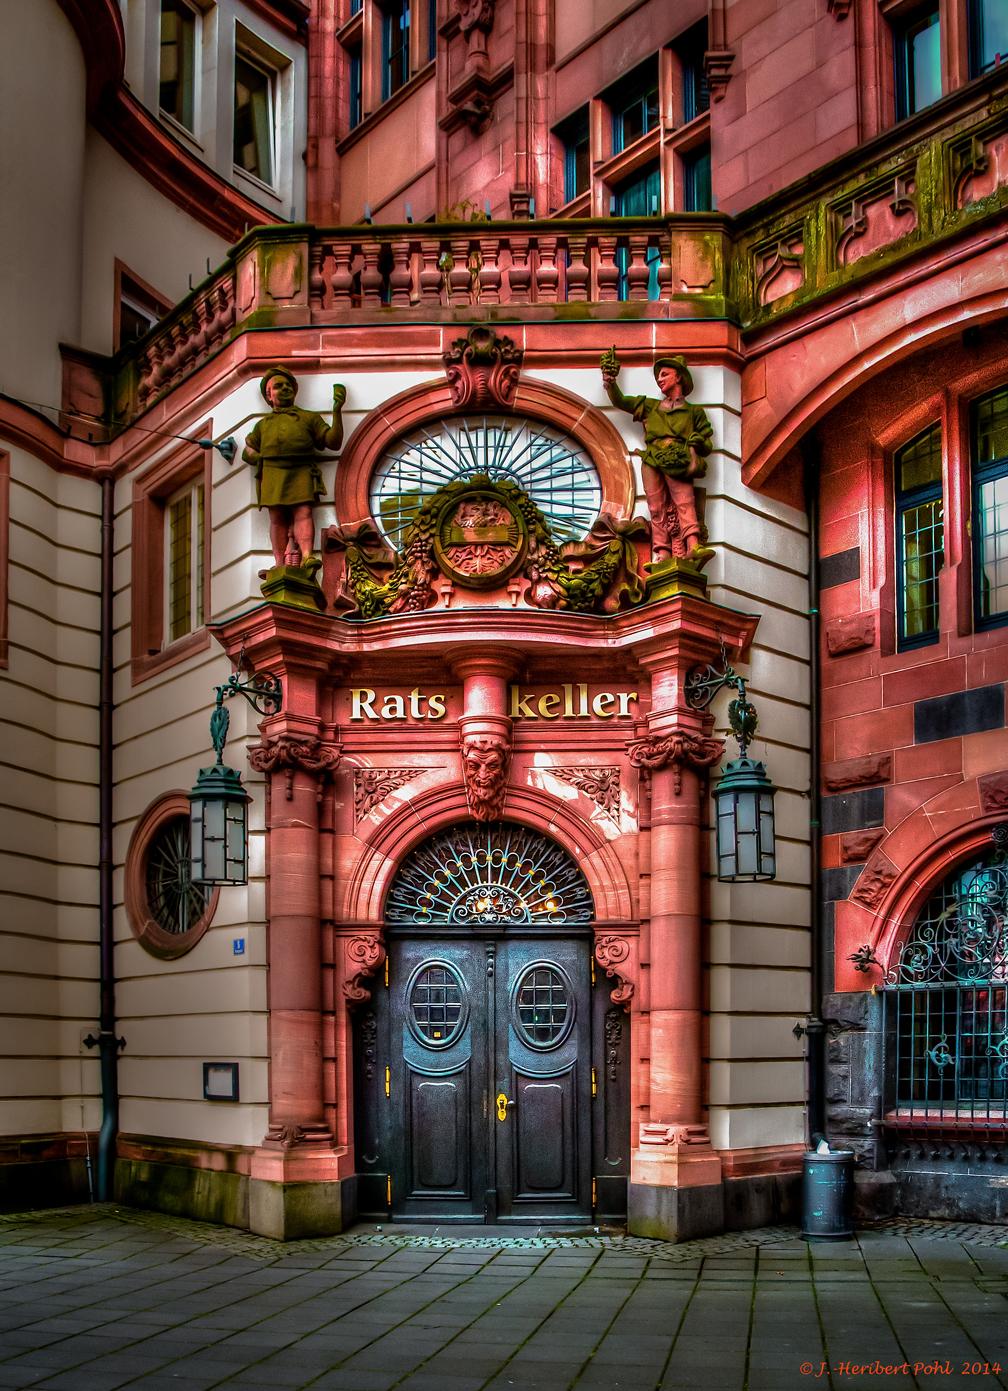 Ratskeller Entrance (photo by J. Herbert Pohl)